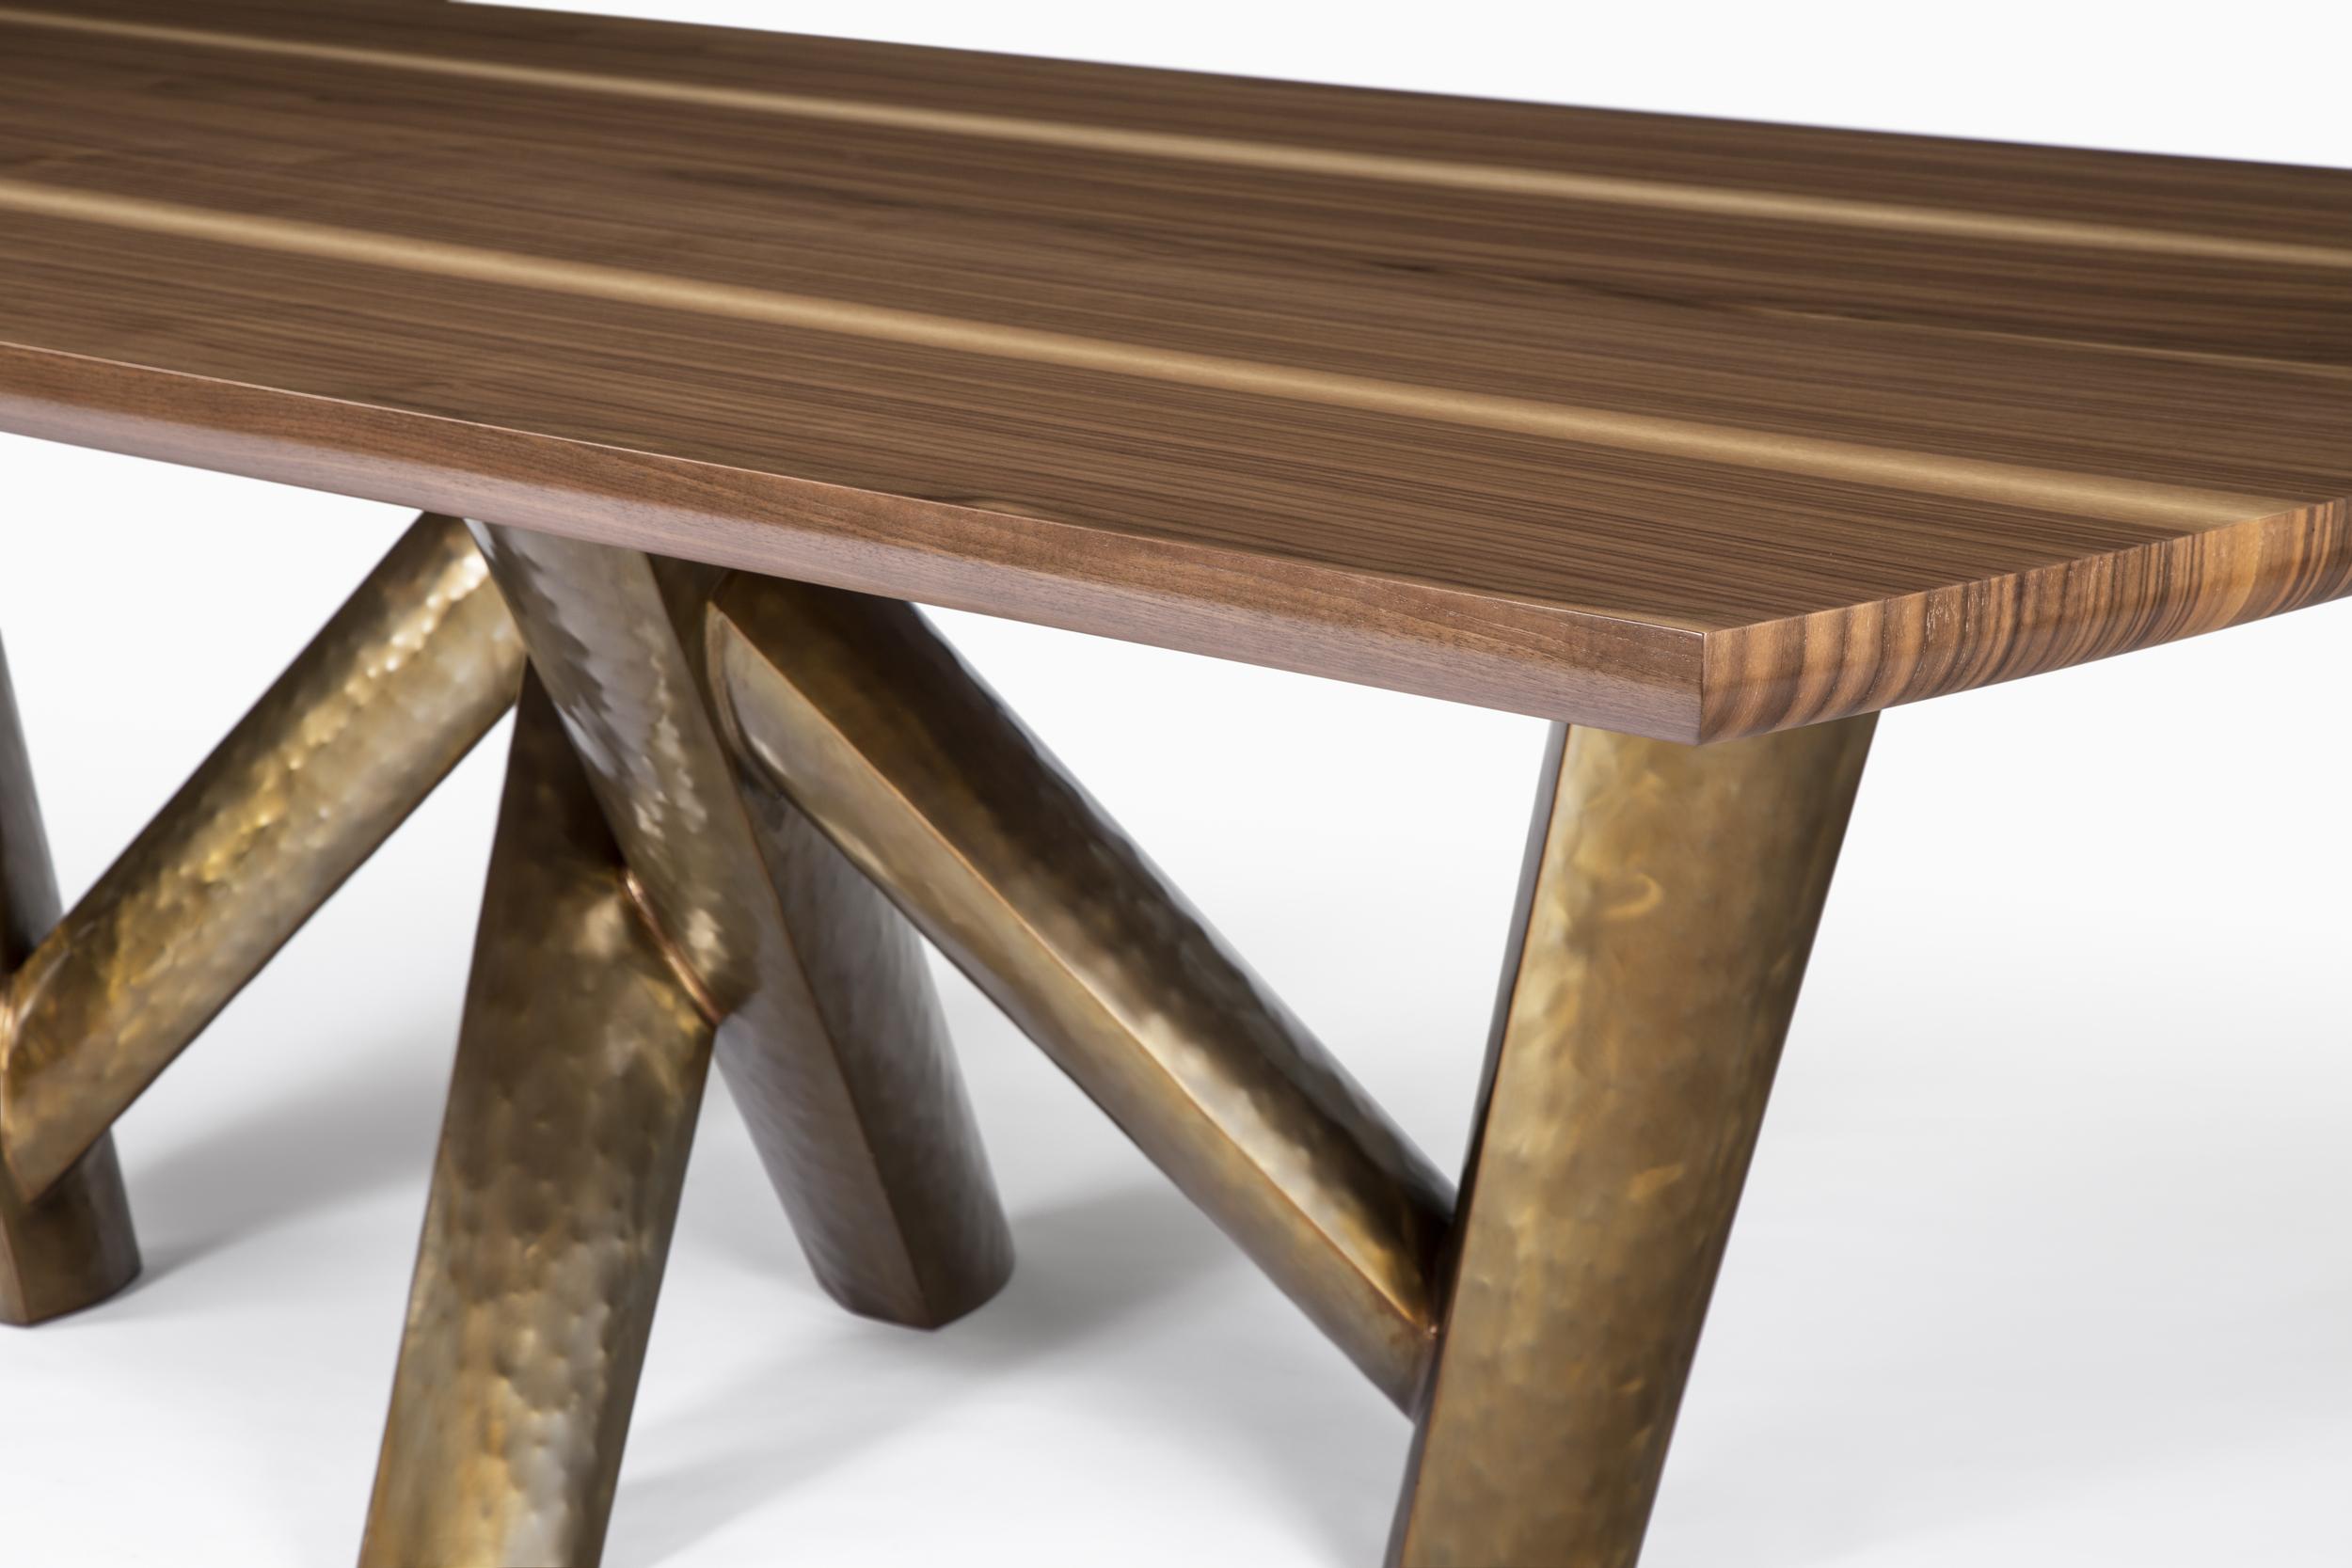 Alexander Dining Table-alternate view.jpg